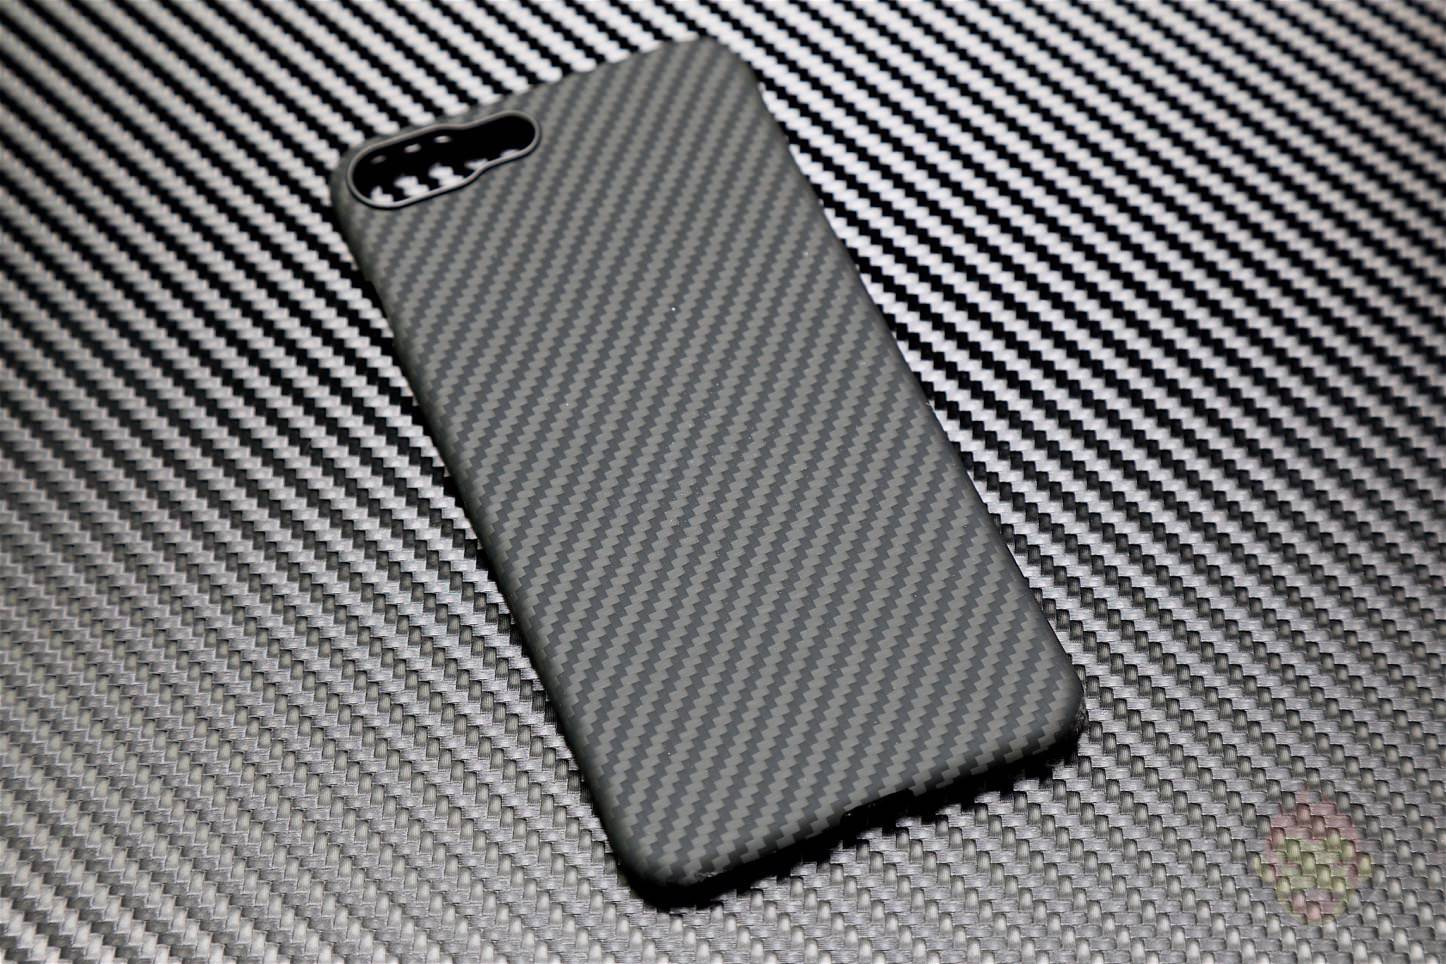 Pitaka-iPhone-Case-Review-02.jpg